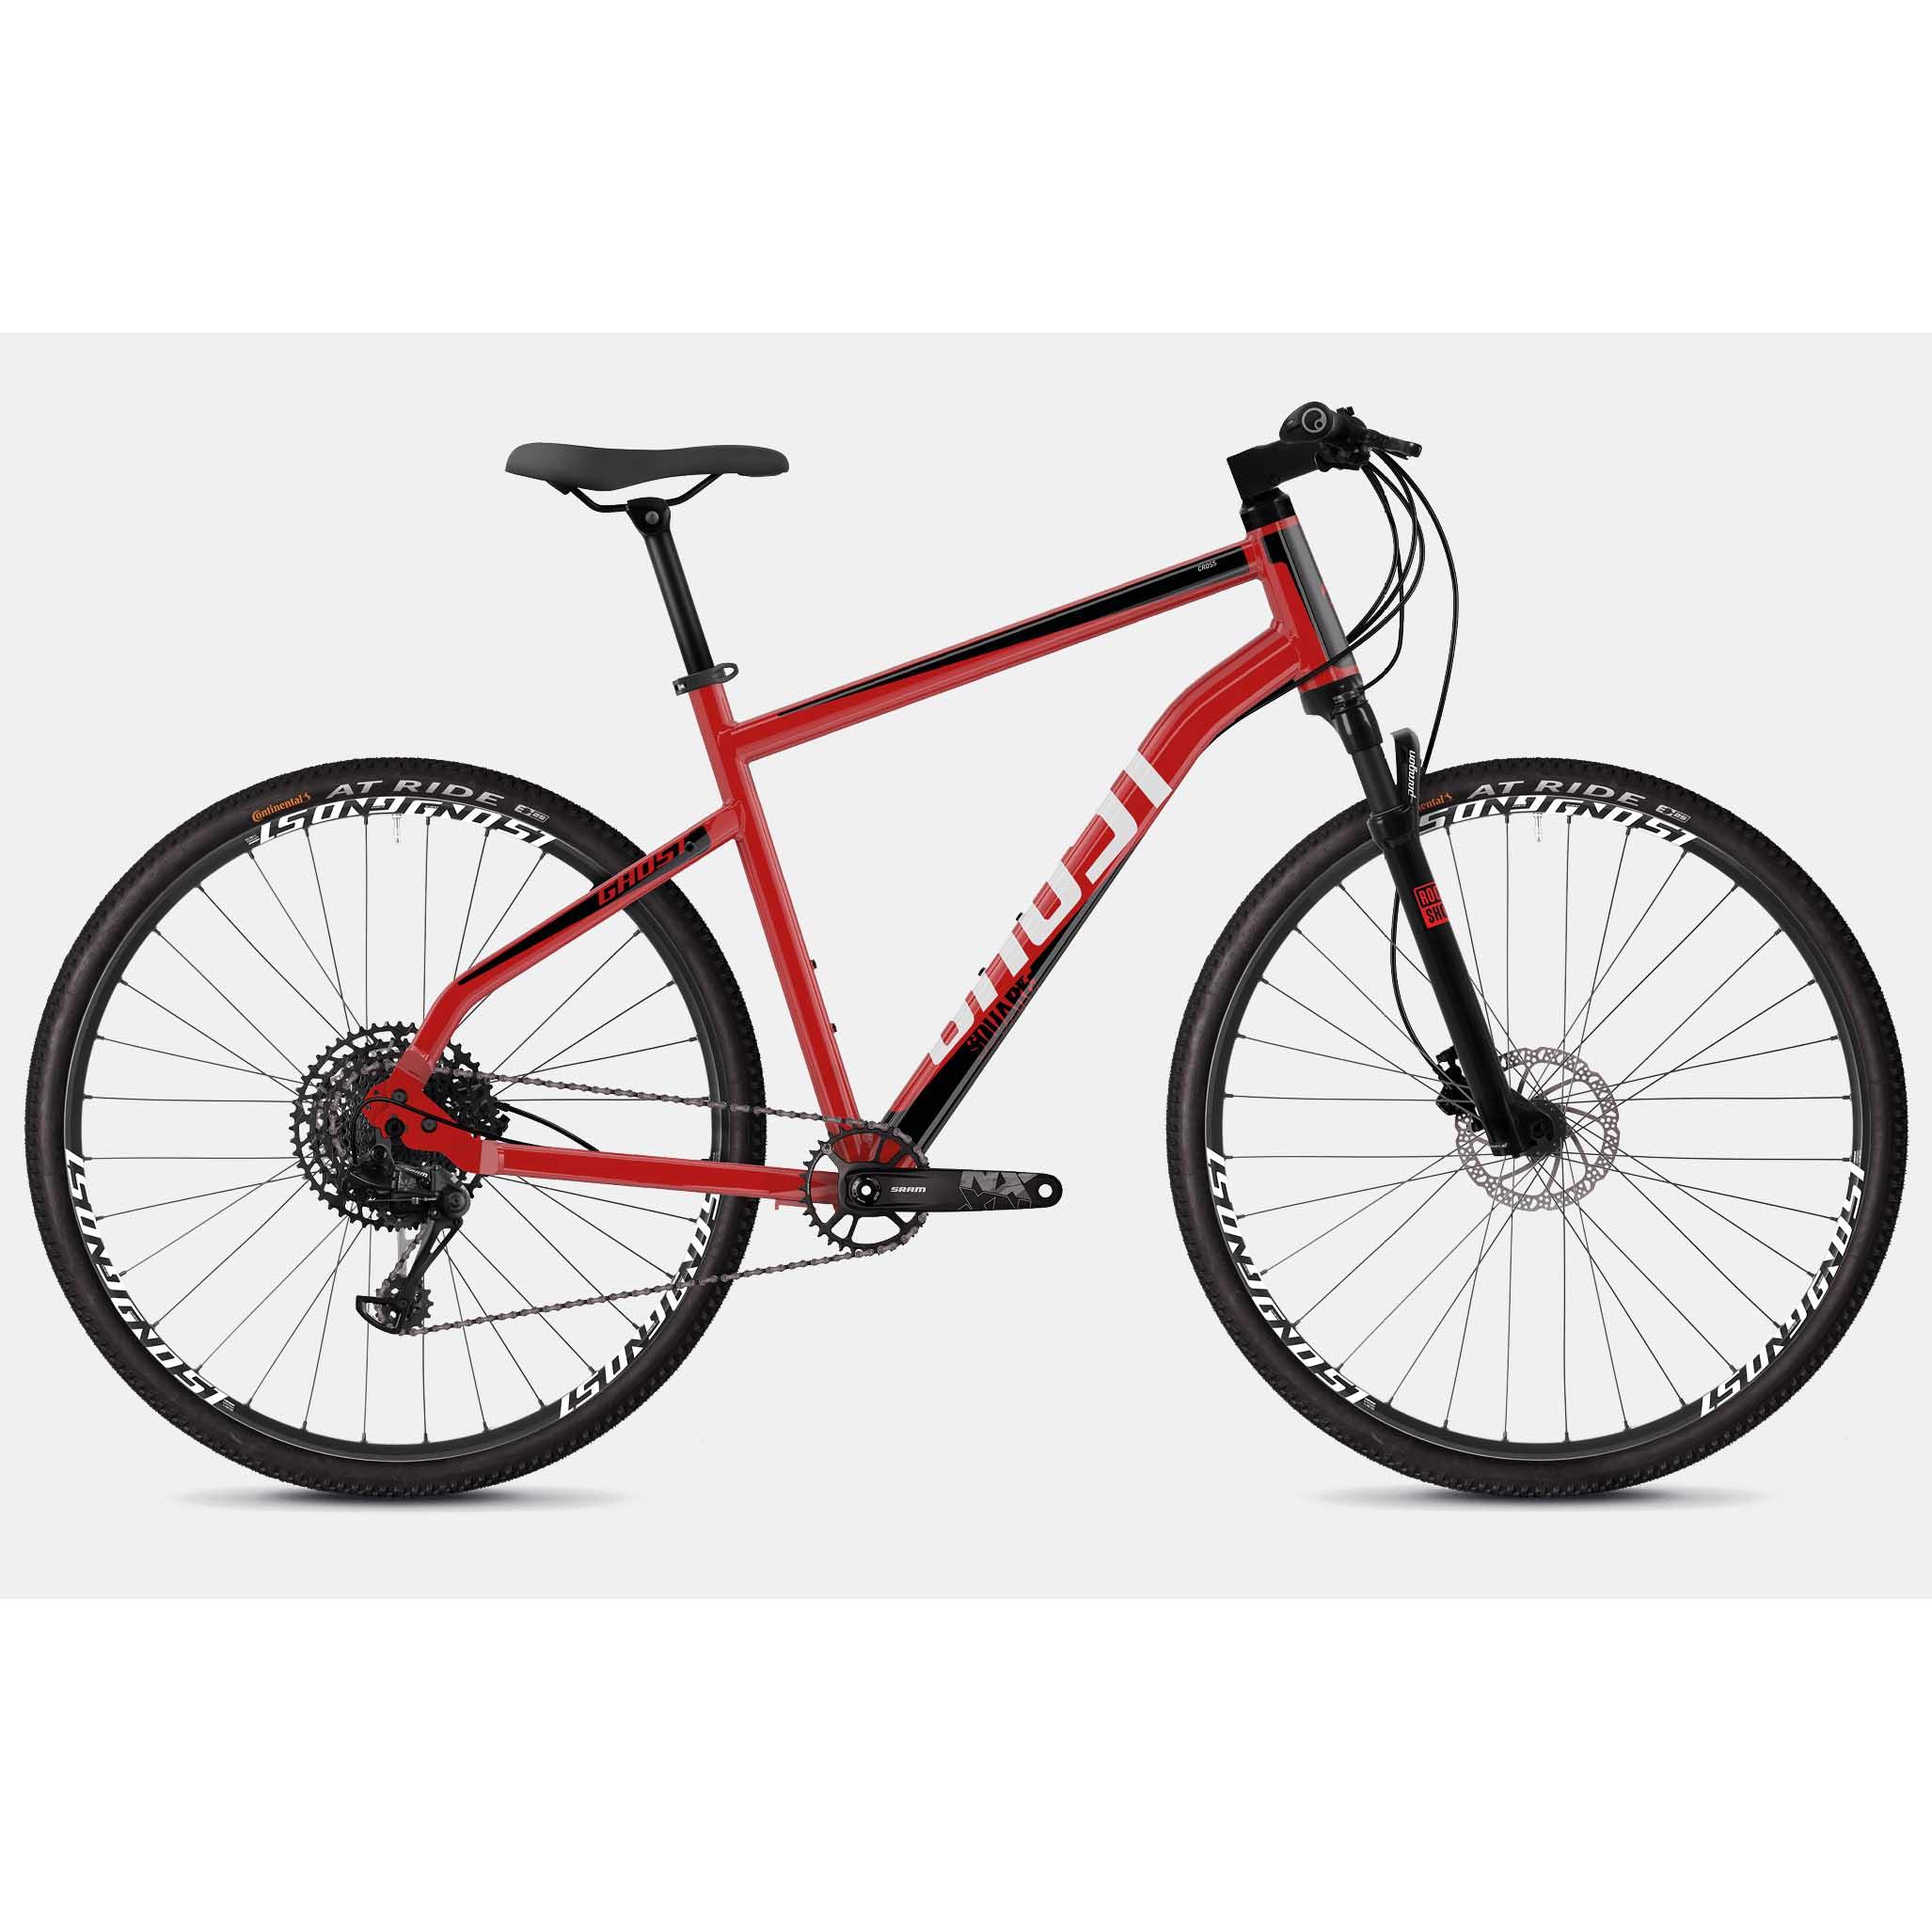 Фото Велосипед Ghost Square Cross 4.8 28″ красно-черно-белый, L, 2019